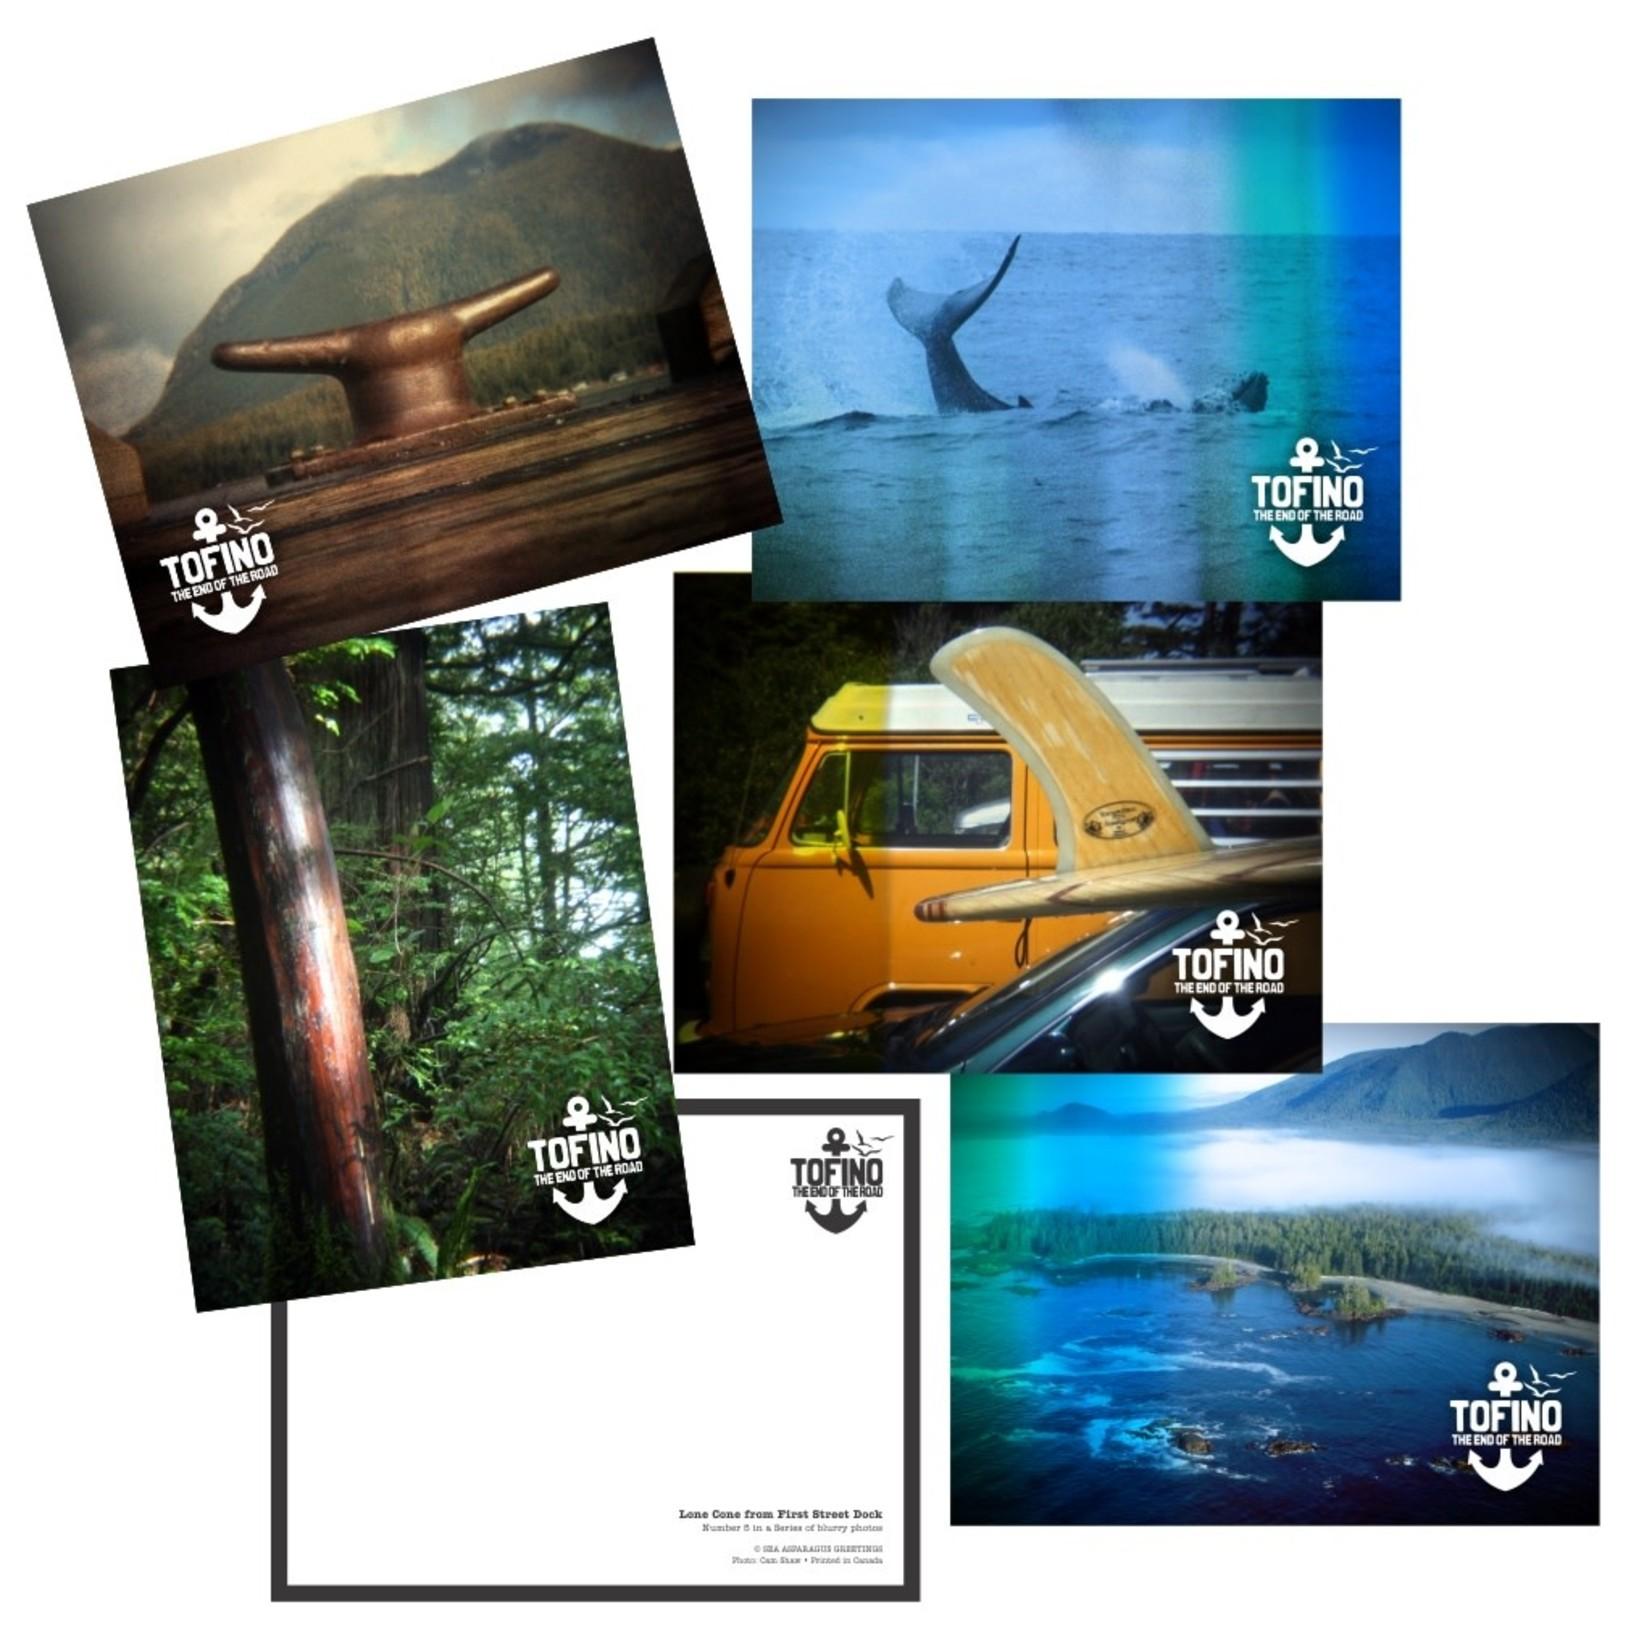 Tofino: End of the Road (5) Postcard Set - Series 1